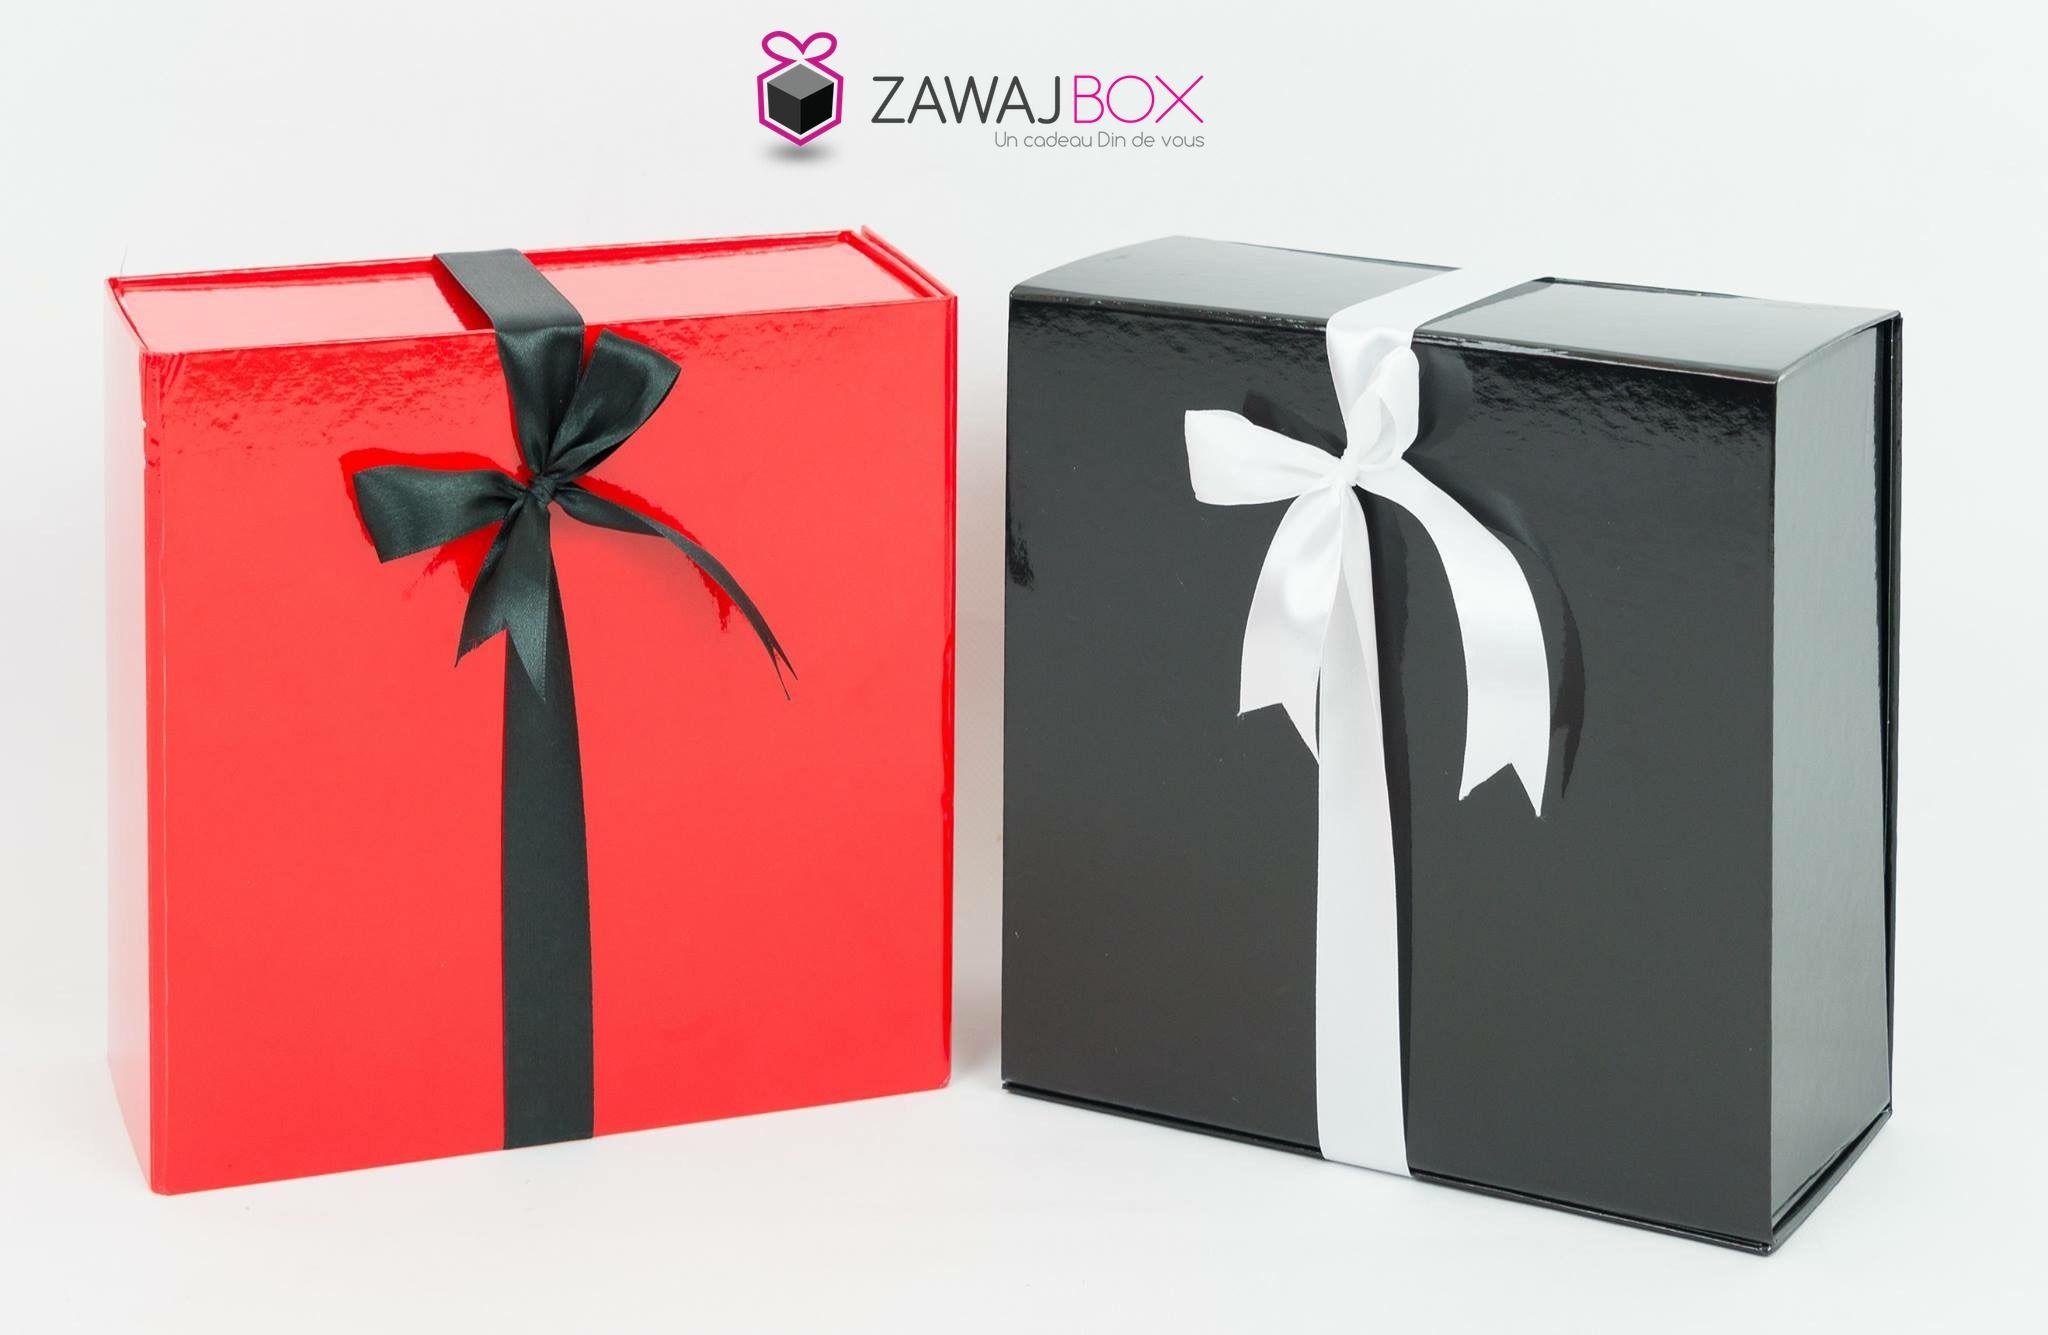 Top ZawajBox® Coffret cadeau couples #musulmans #Muslim #Gifts | La  ZW33